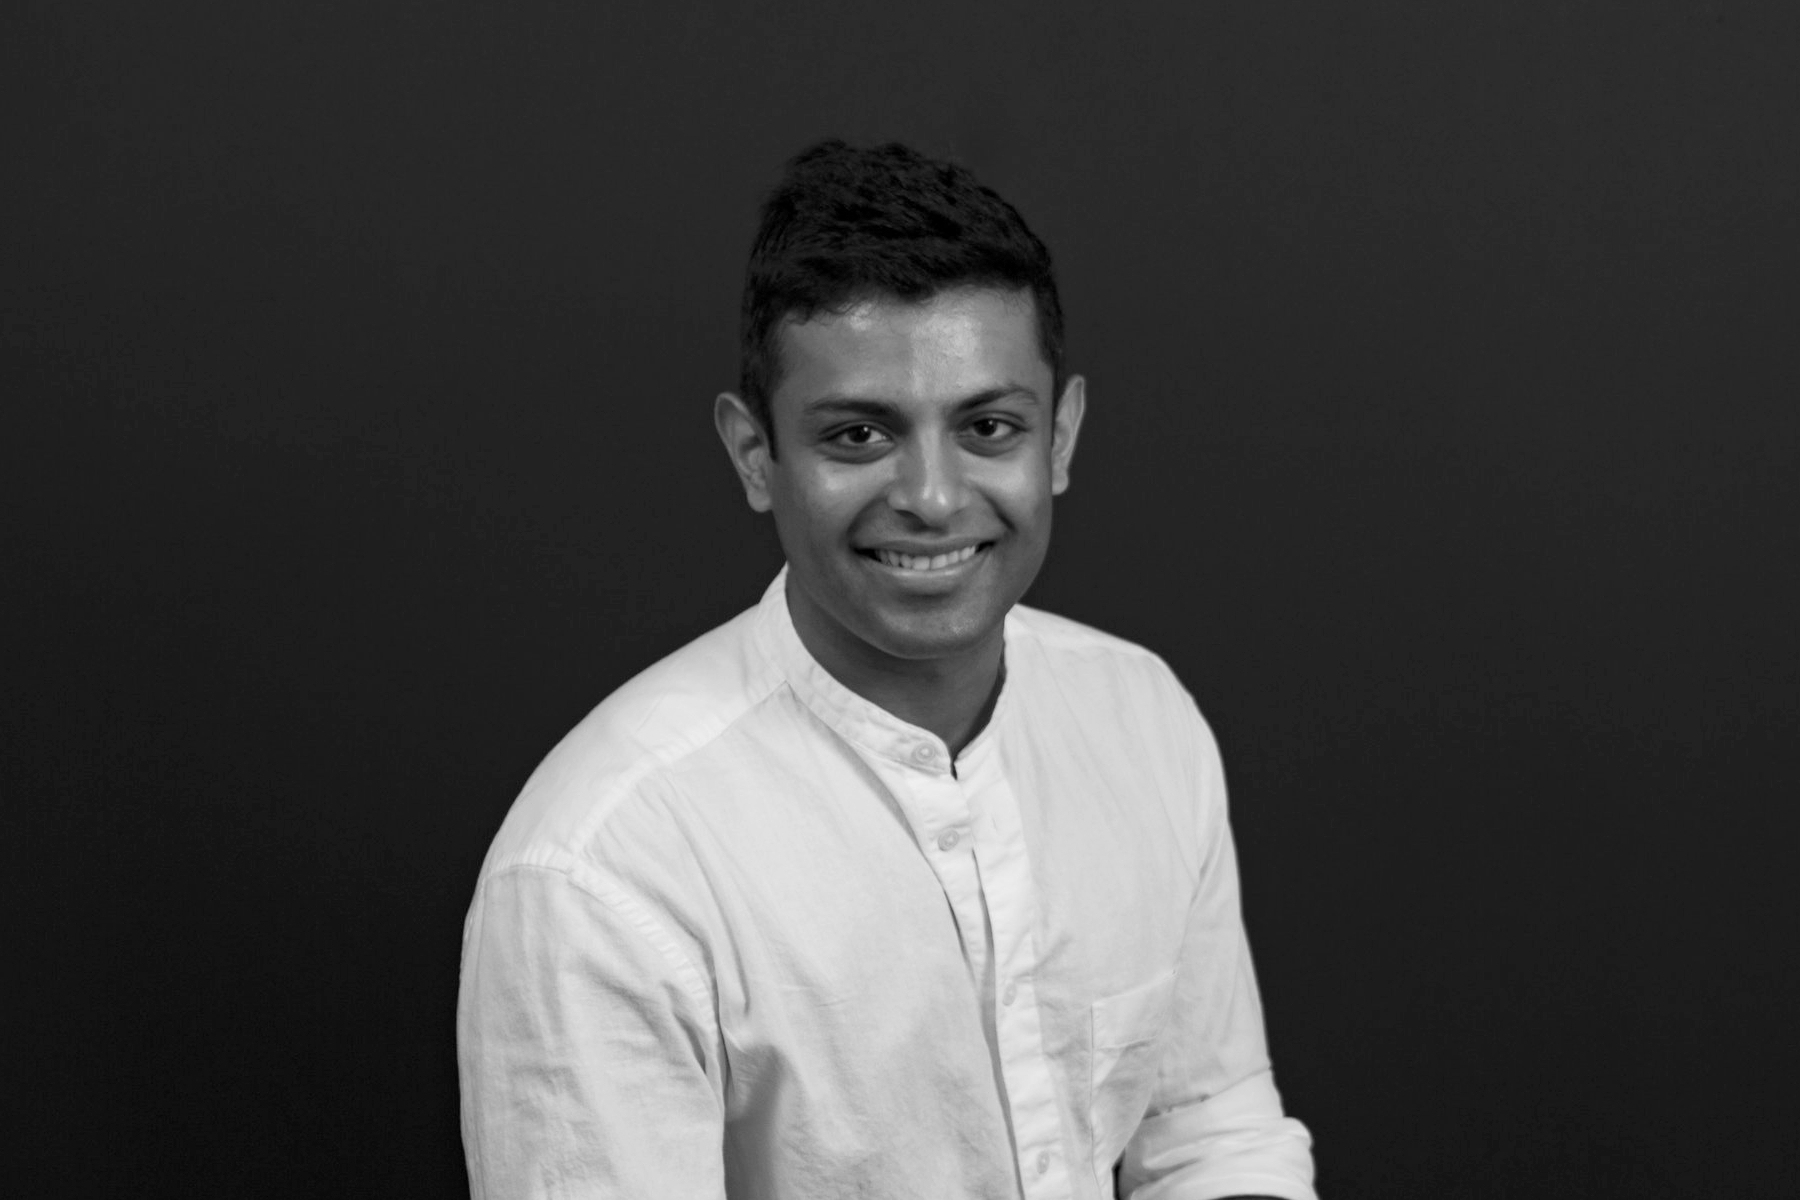 Ajay Jayakumar